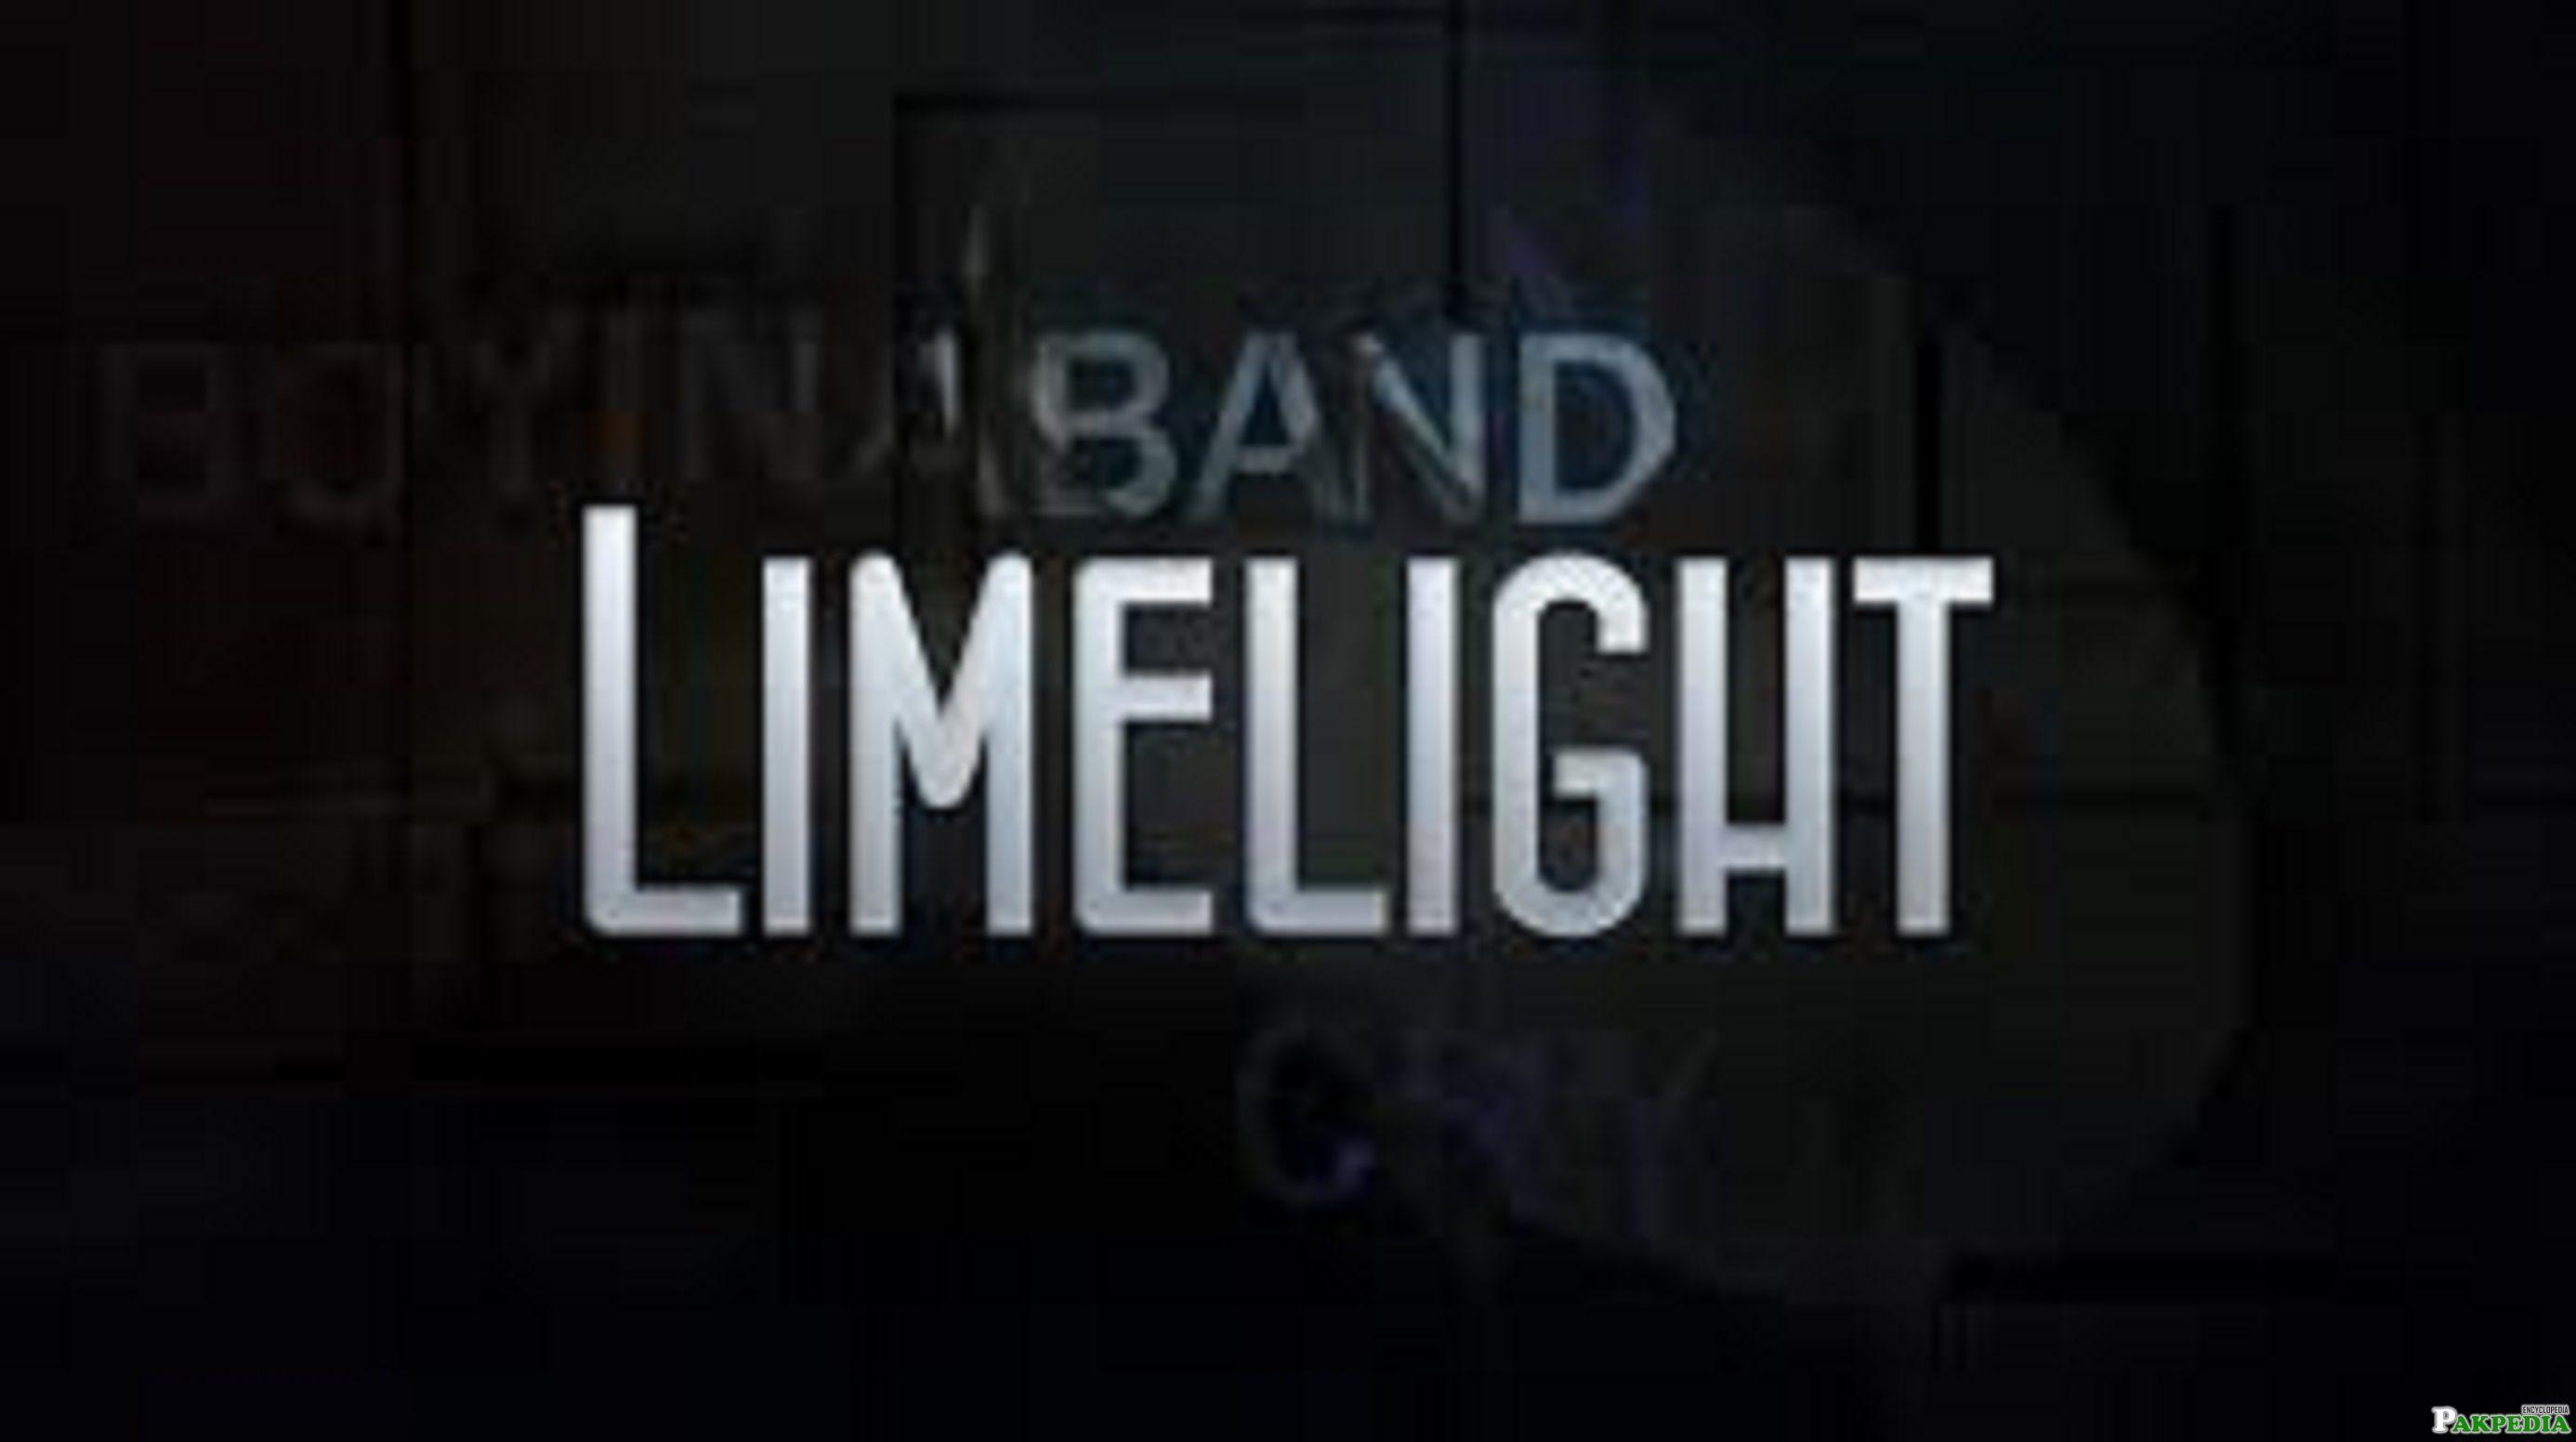 Lime light brand